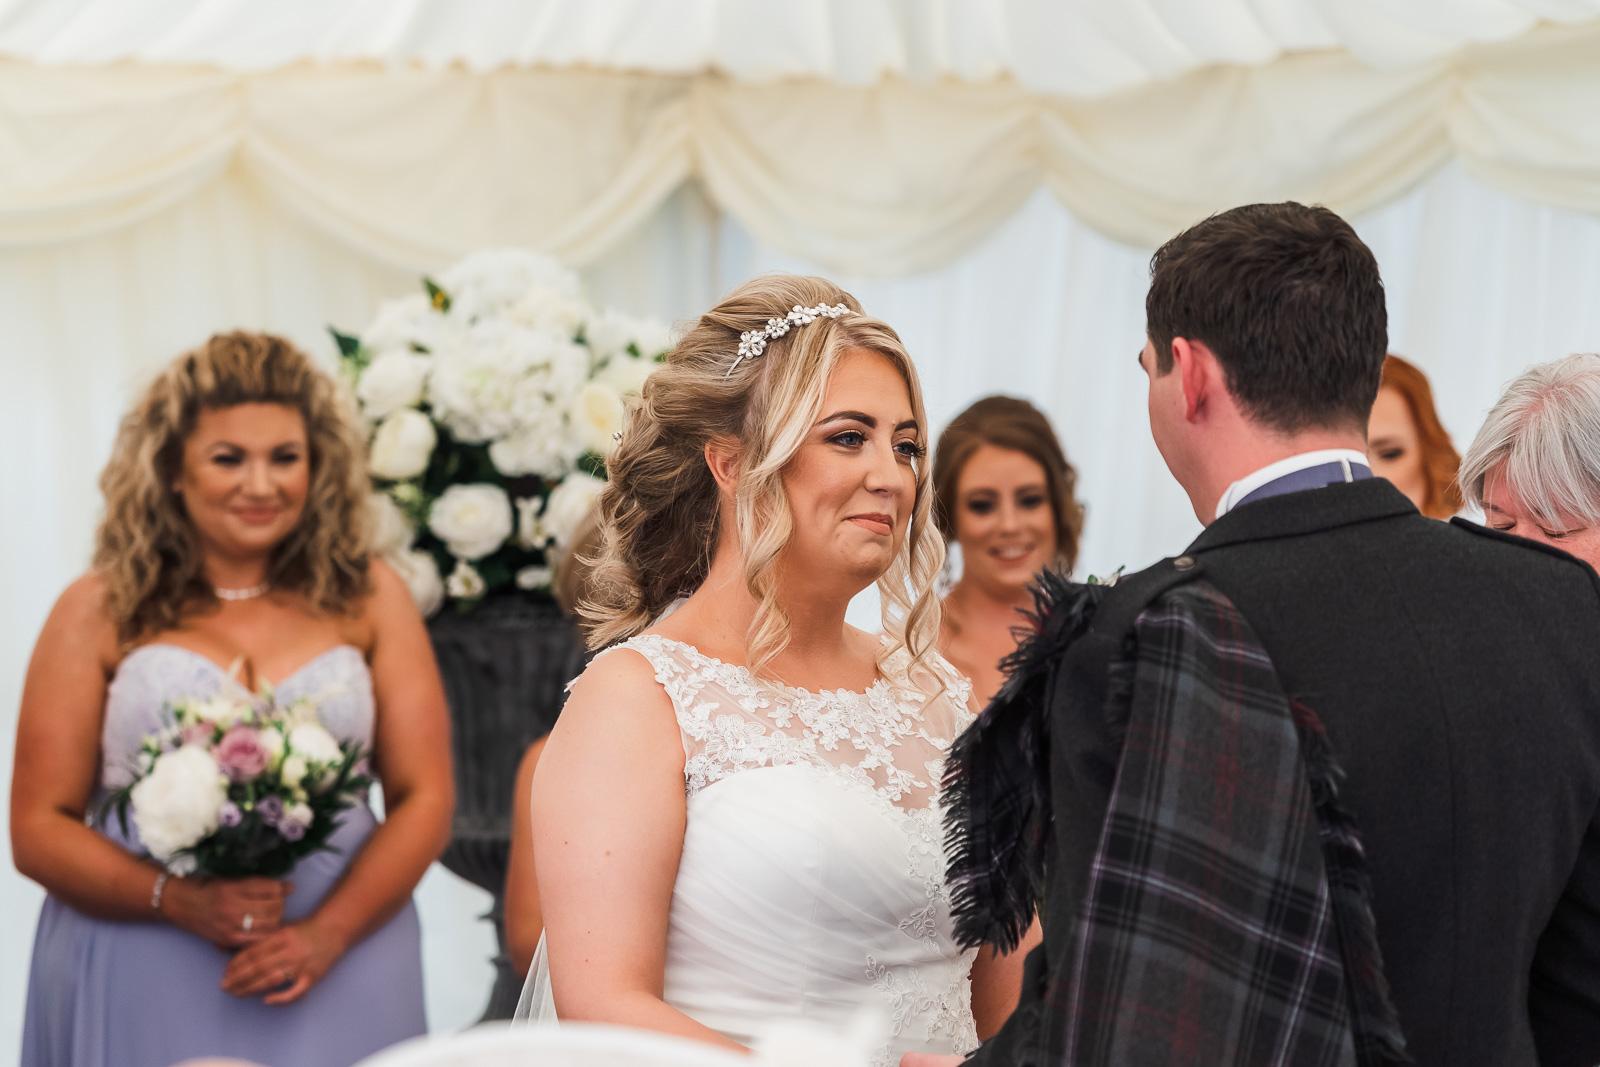 cornhill_castle_wedding_biggar_dearlyphotography (115 of 448).jpg